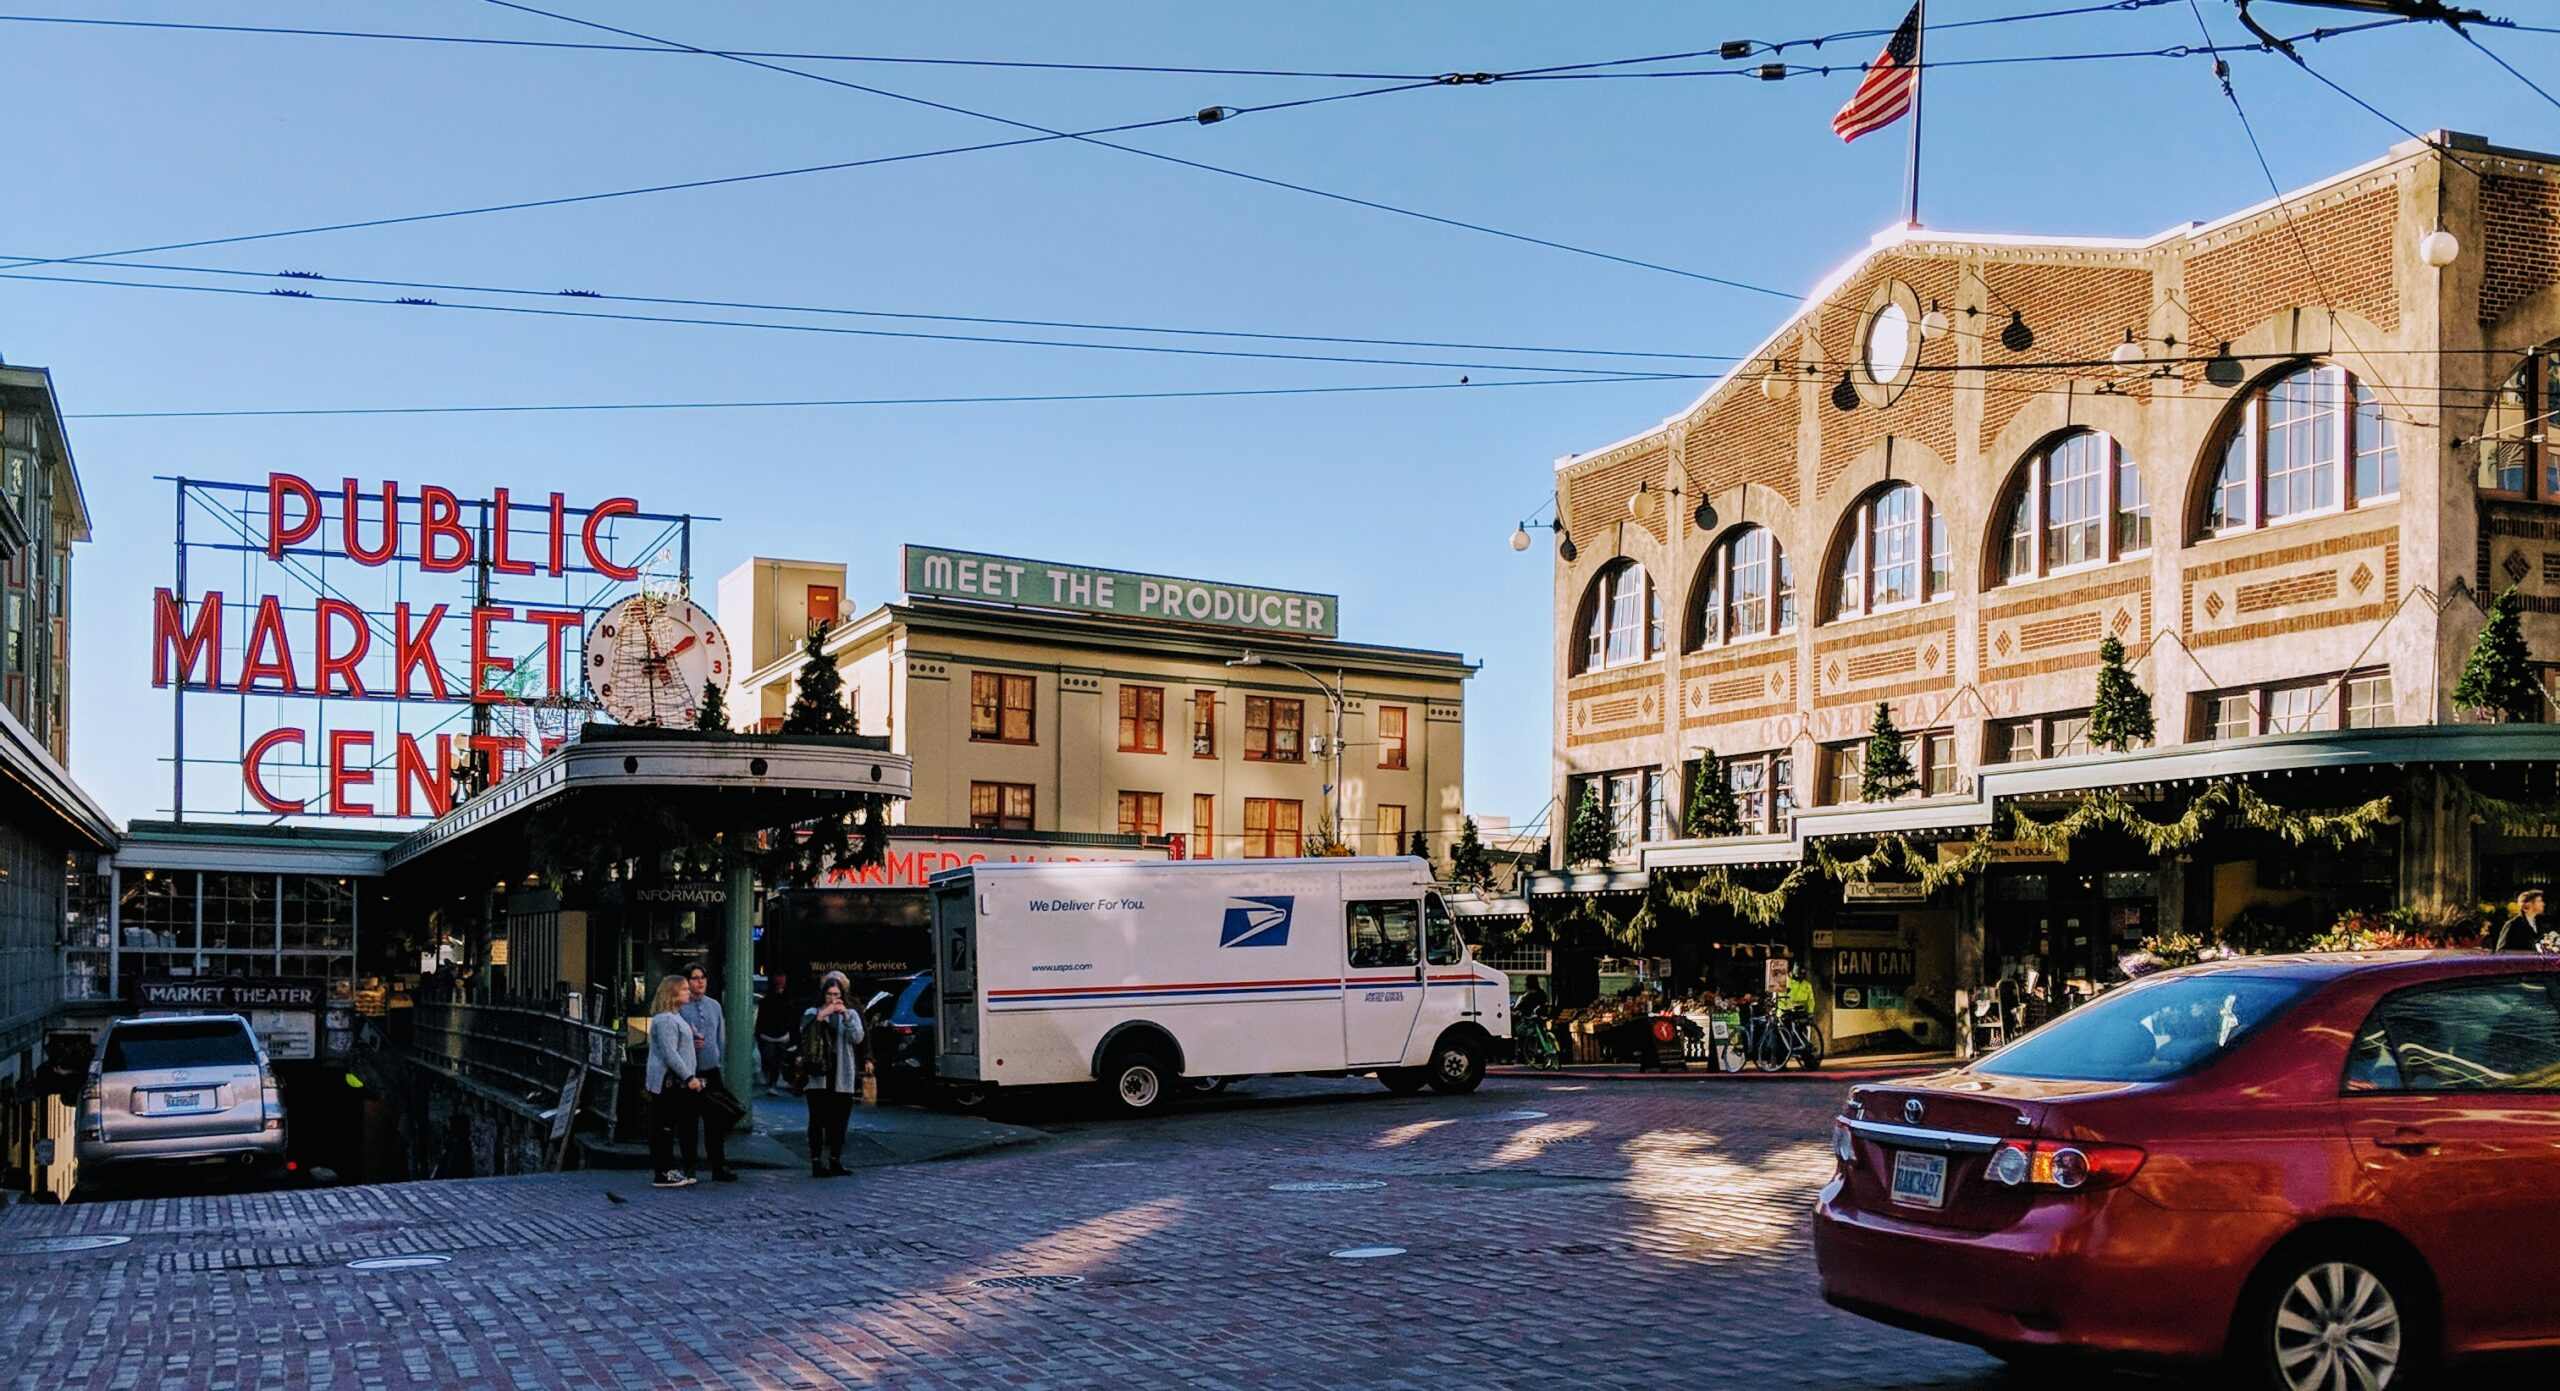 Pike place market's entrance.